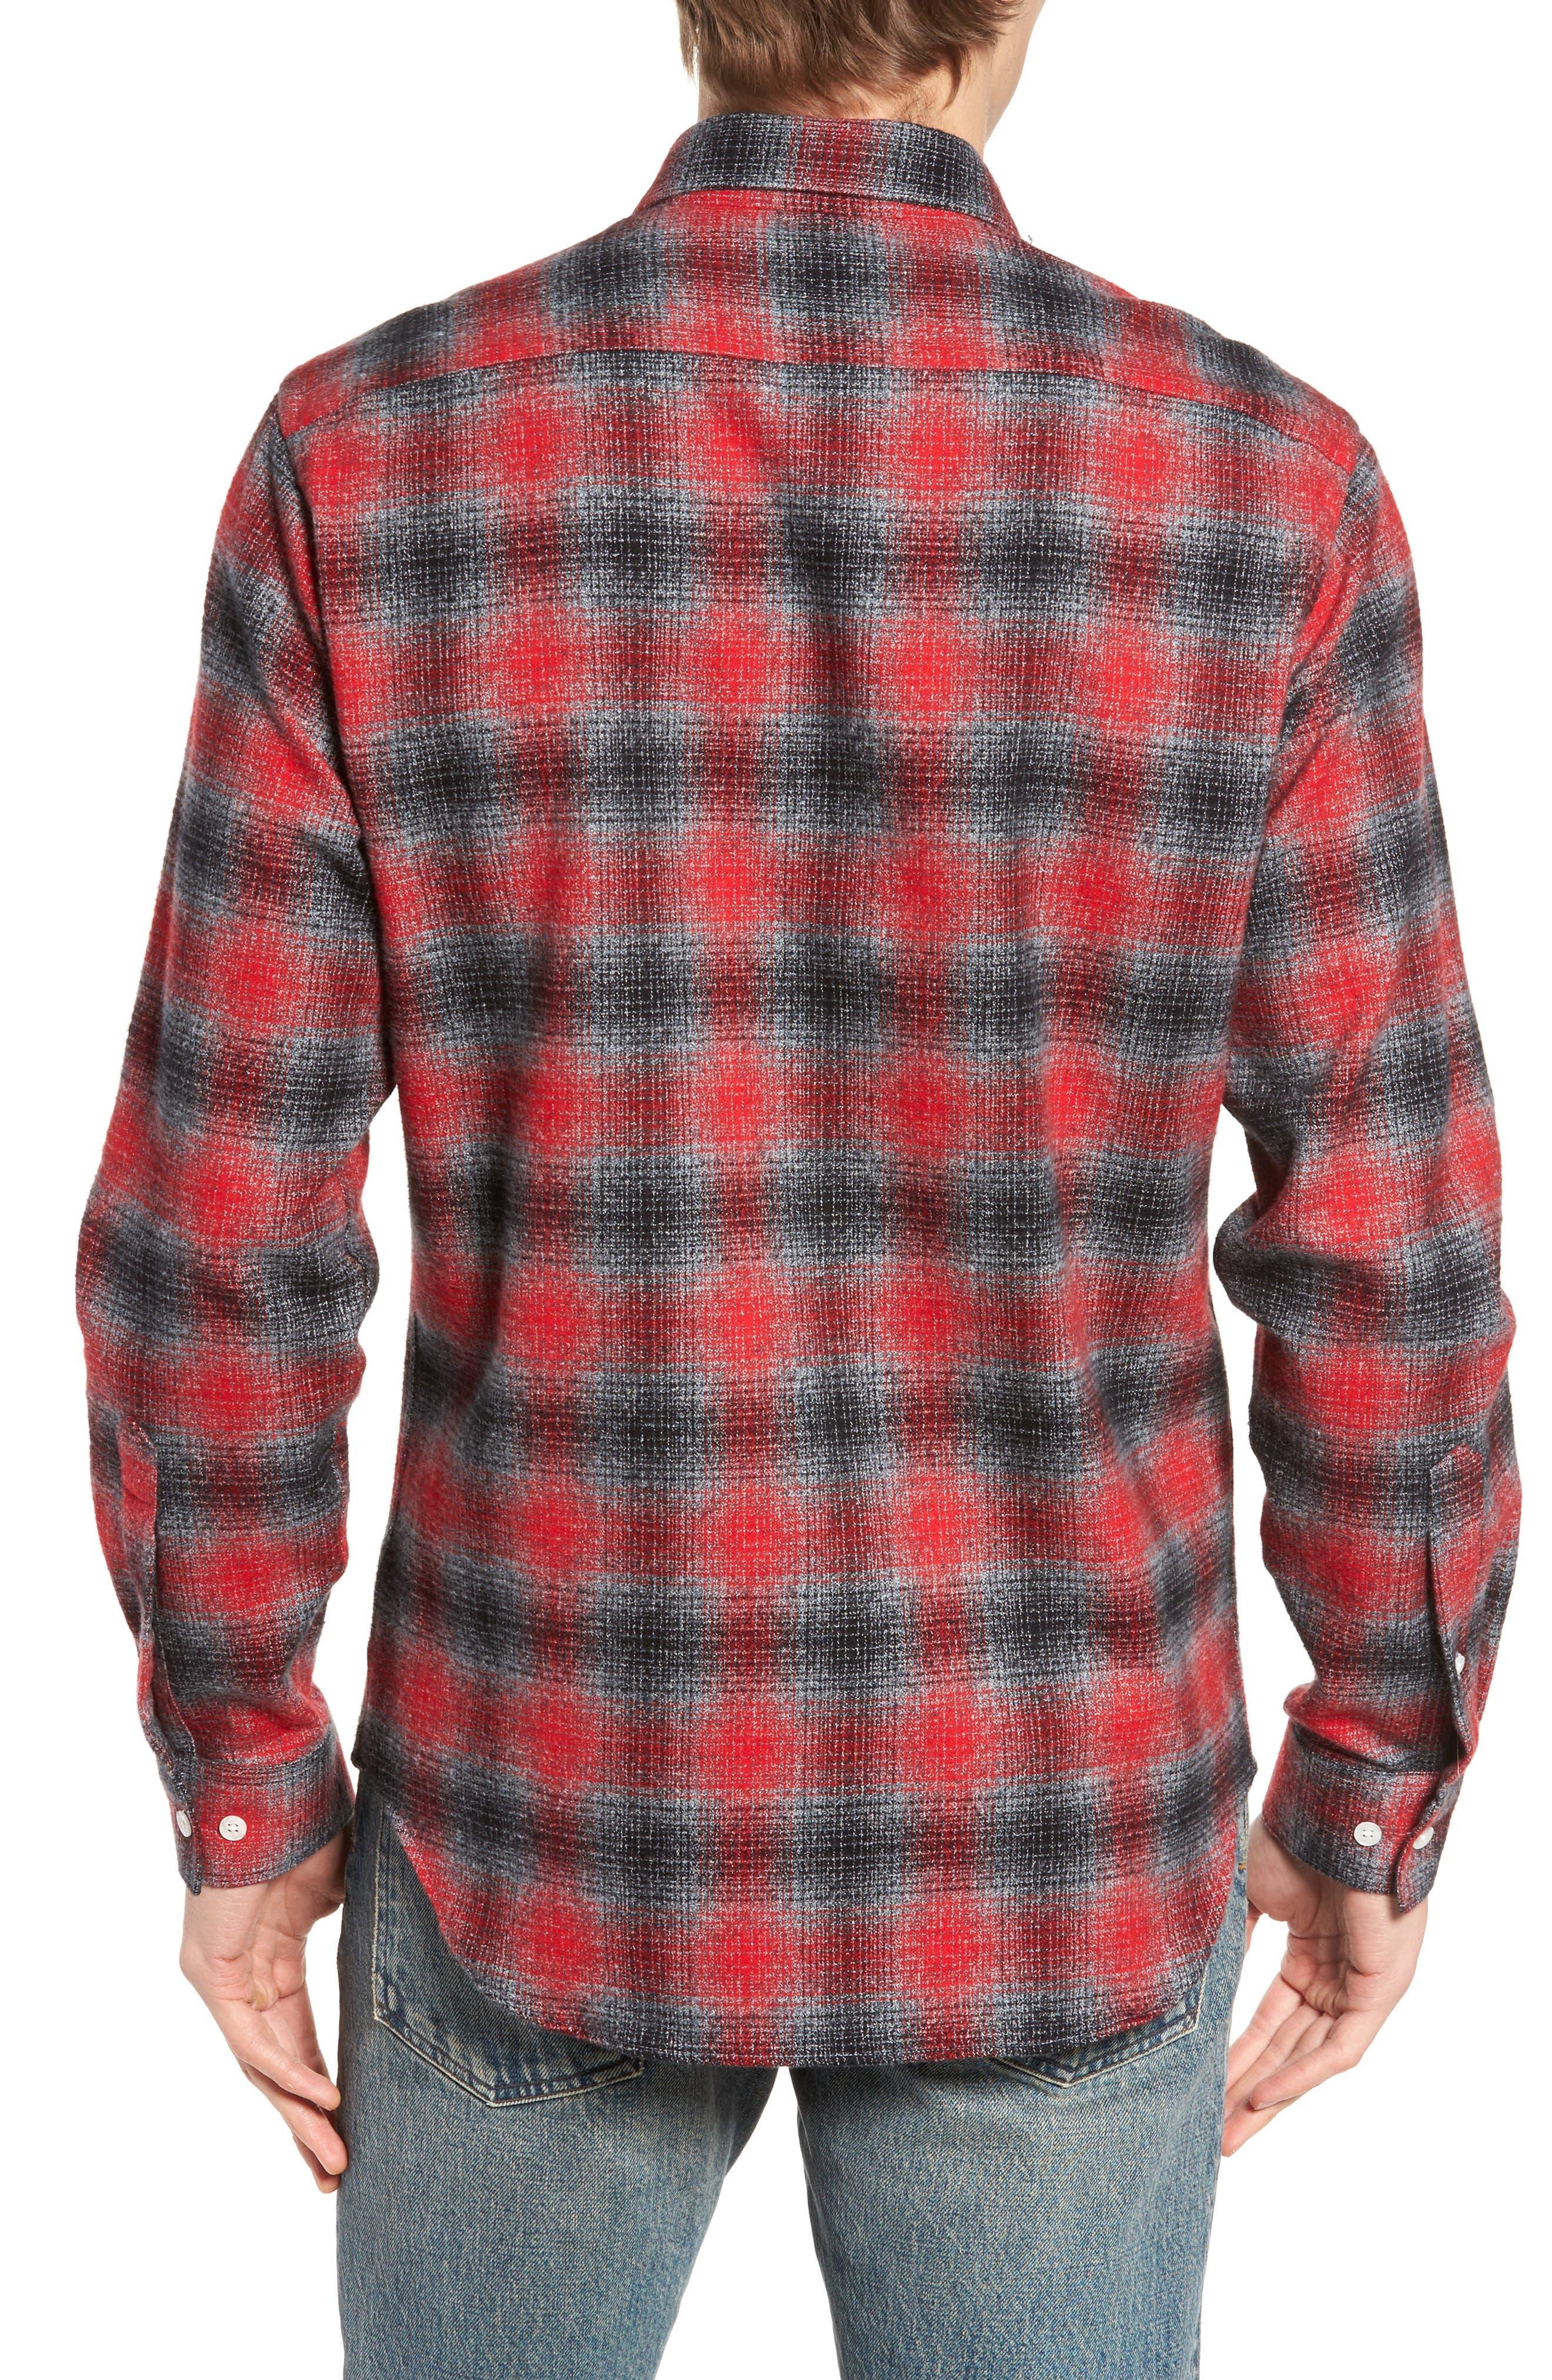 Stowe Slim Fit Plaid Sport Shirt,                             Alternate thumbnail 2, color,                             021